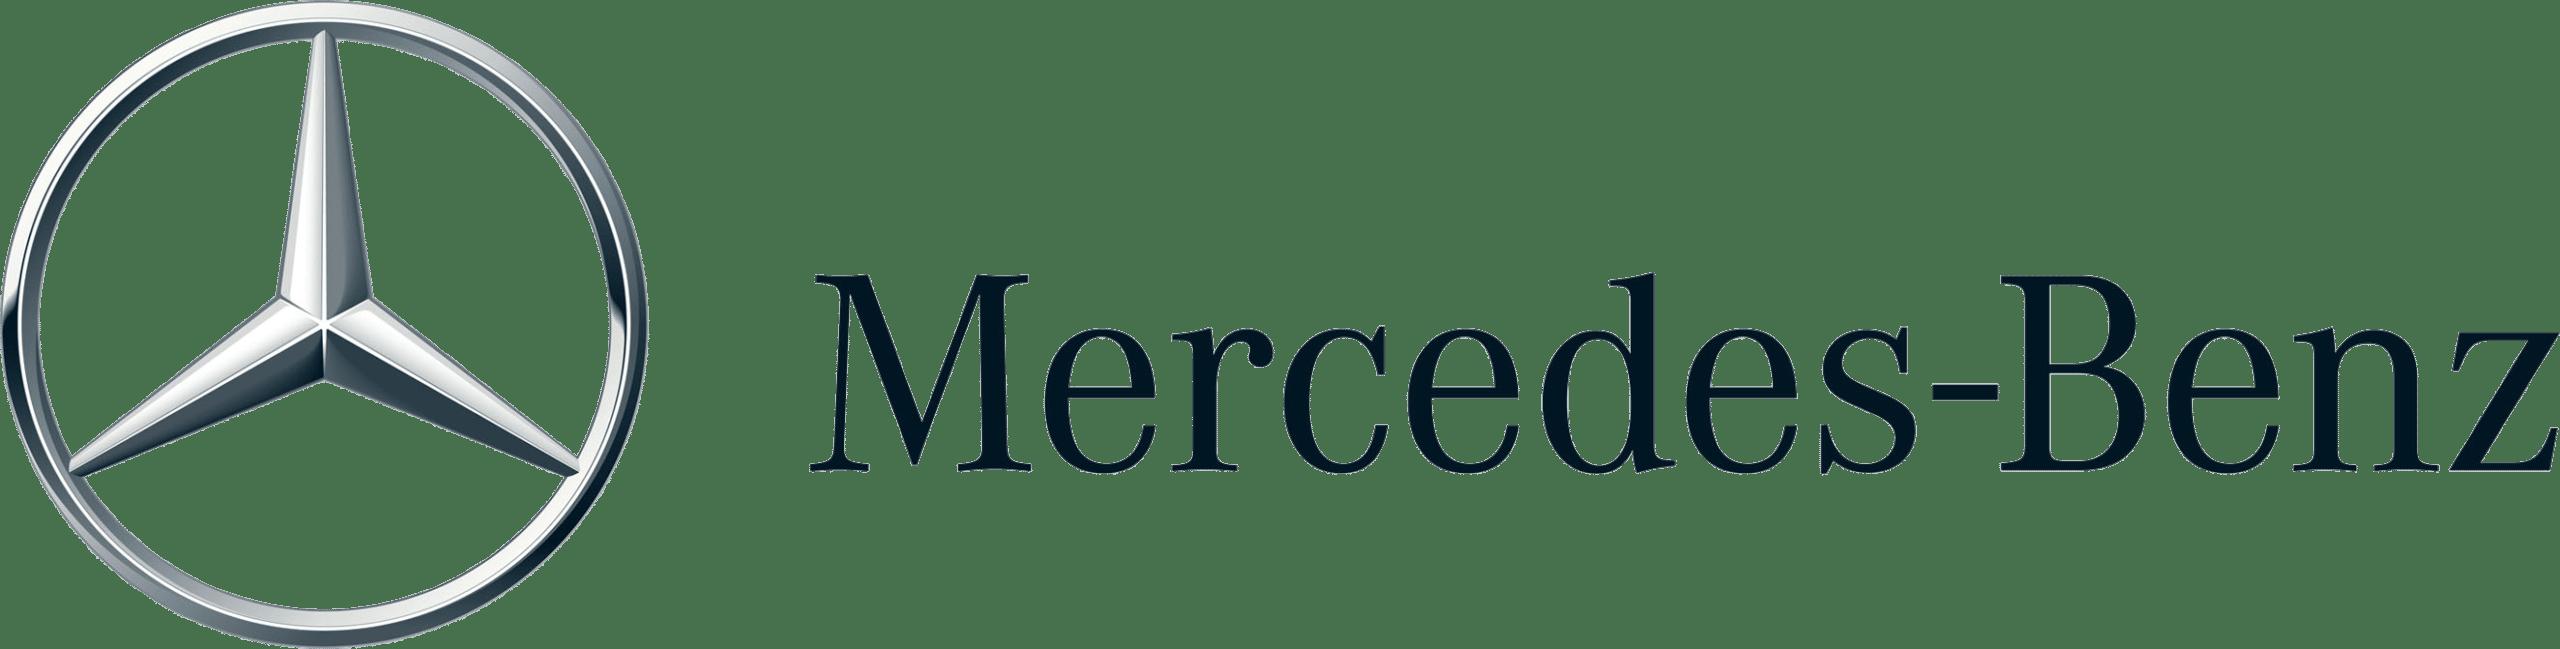 Mercedes Benz company logo